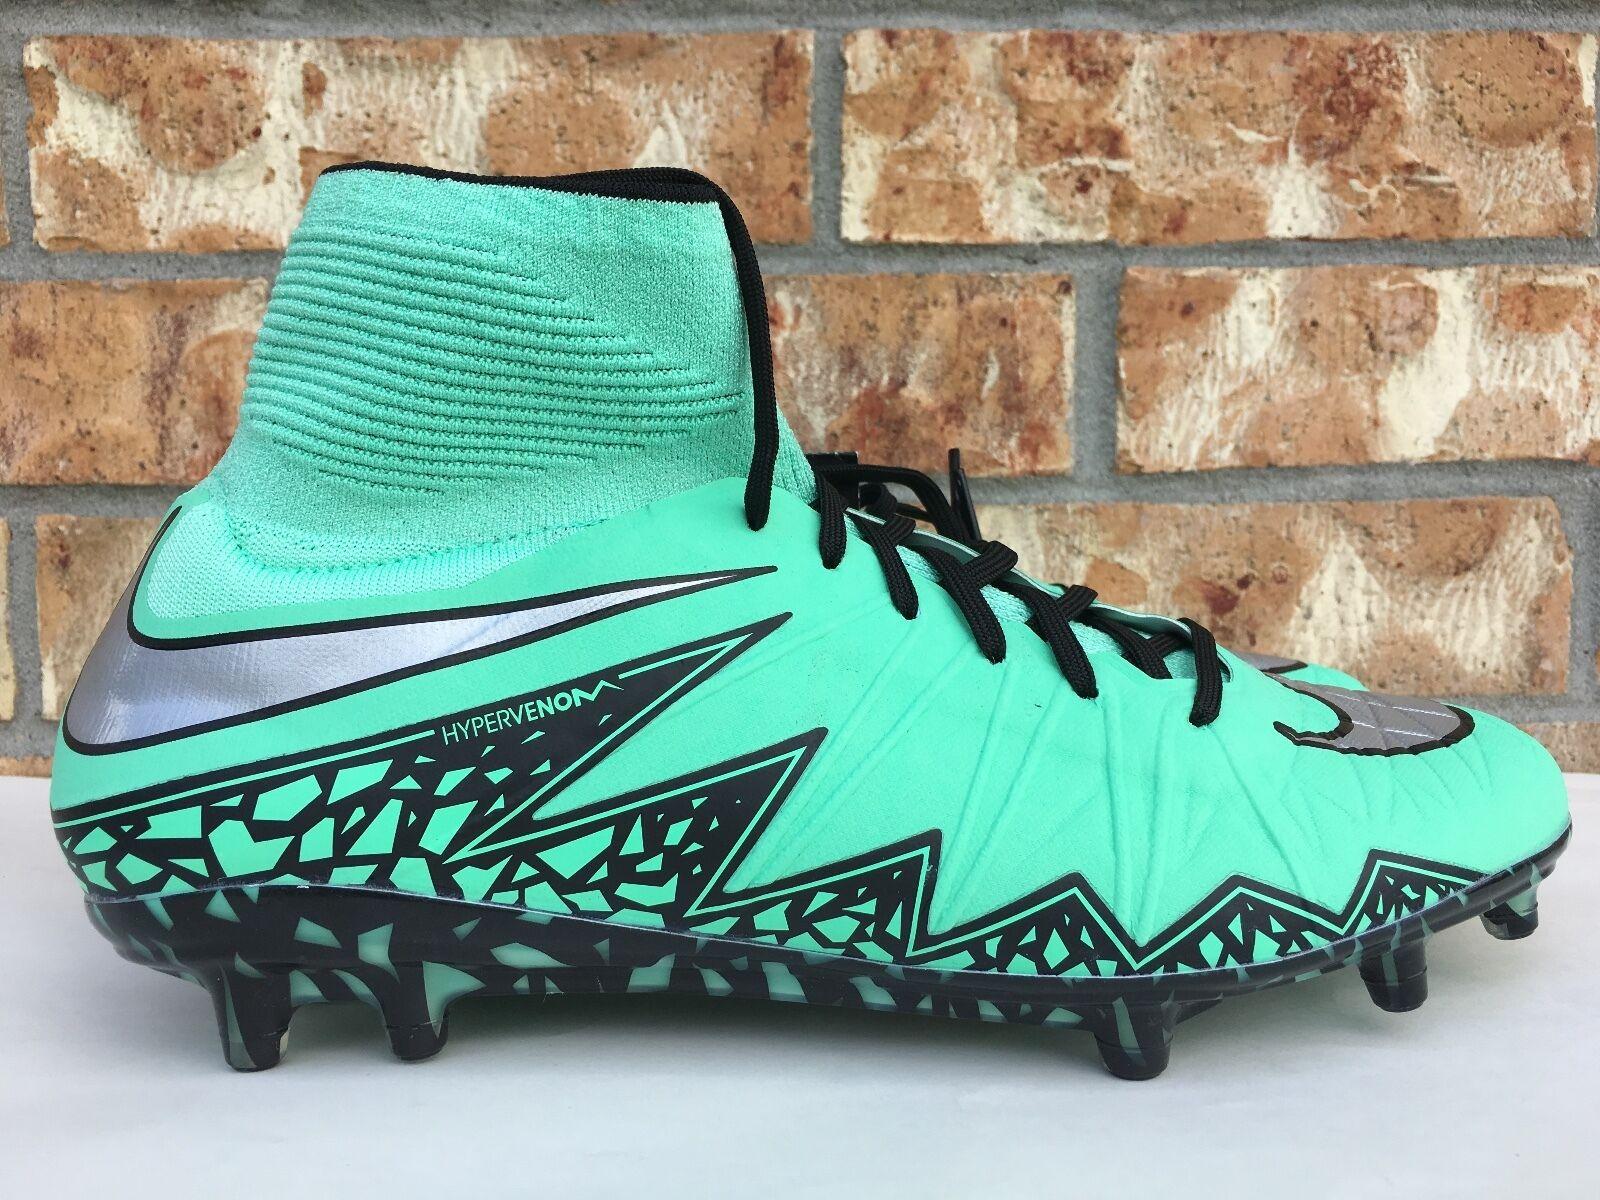 Los hombres de Nike hypervenom Phantom II FG metal soccer cleats Verde Glow metal FG 747213-309 14ecb2